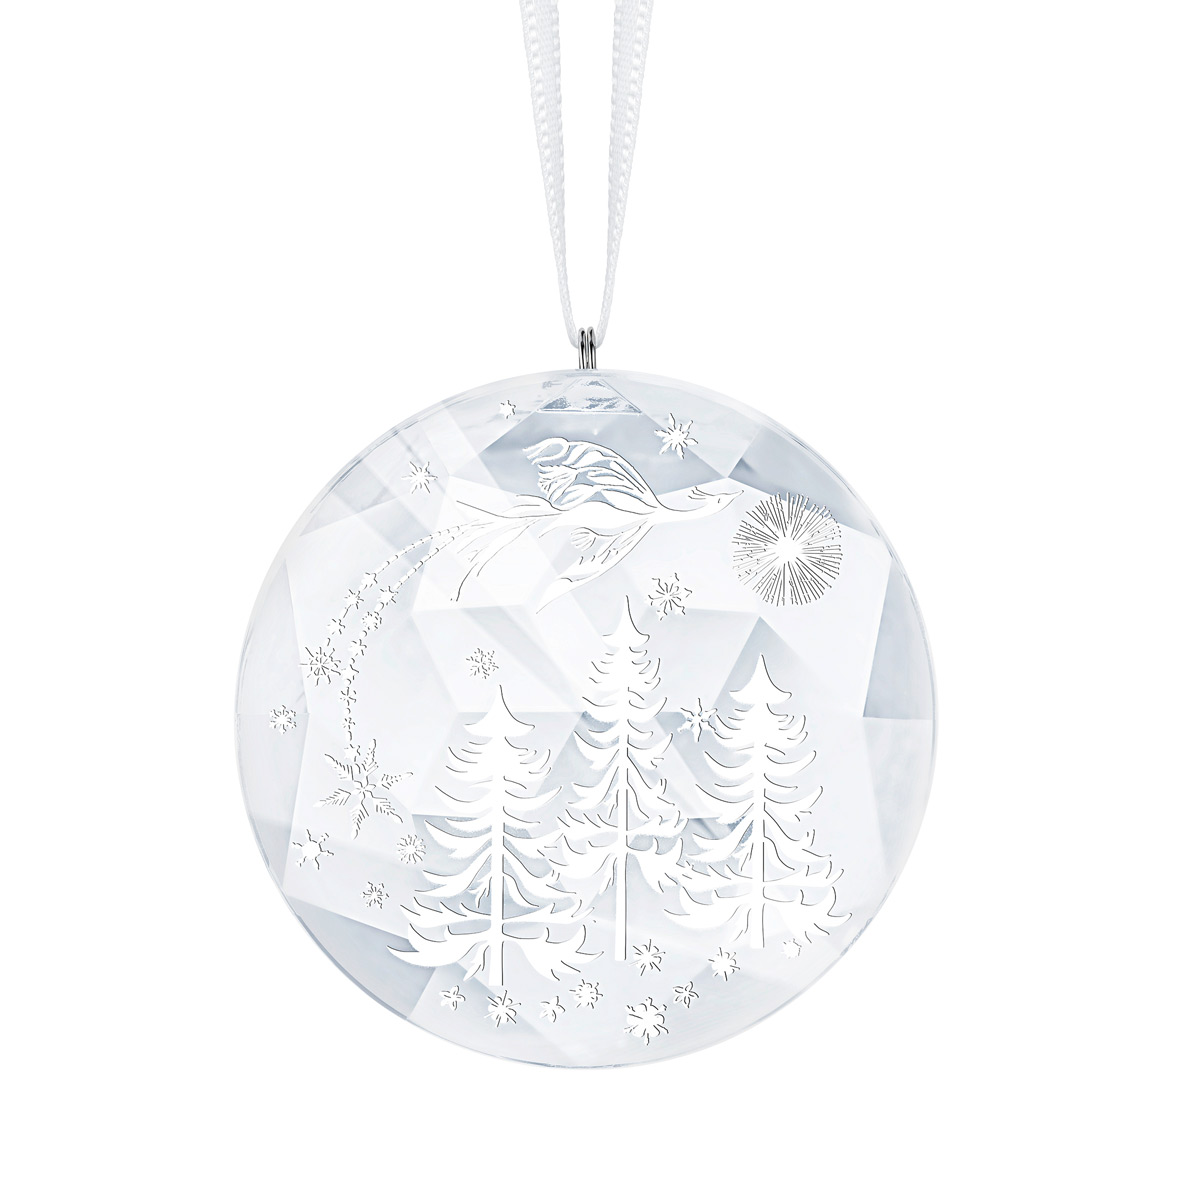 Swarovski Winter Night Ornament